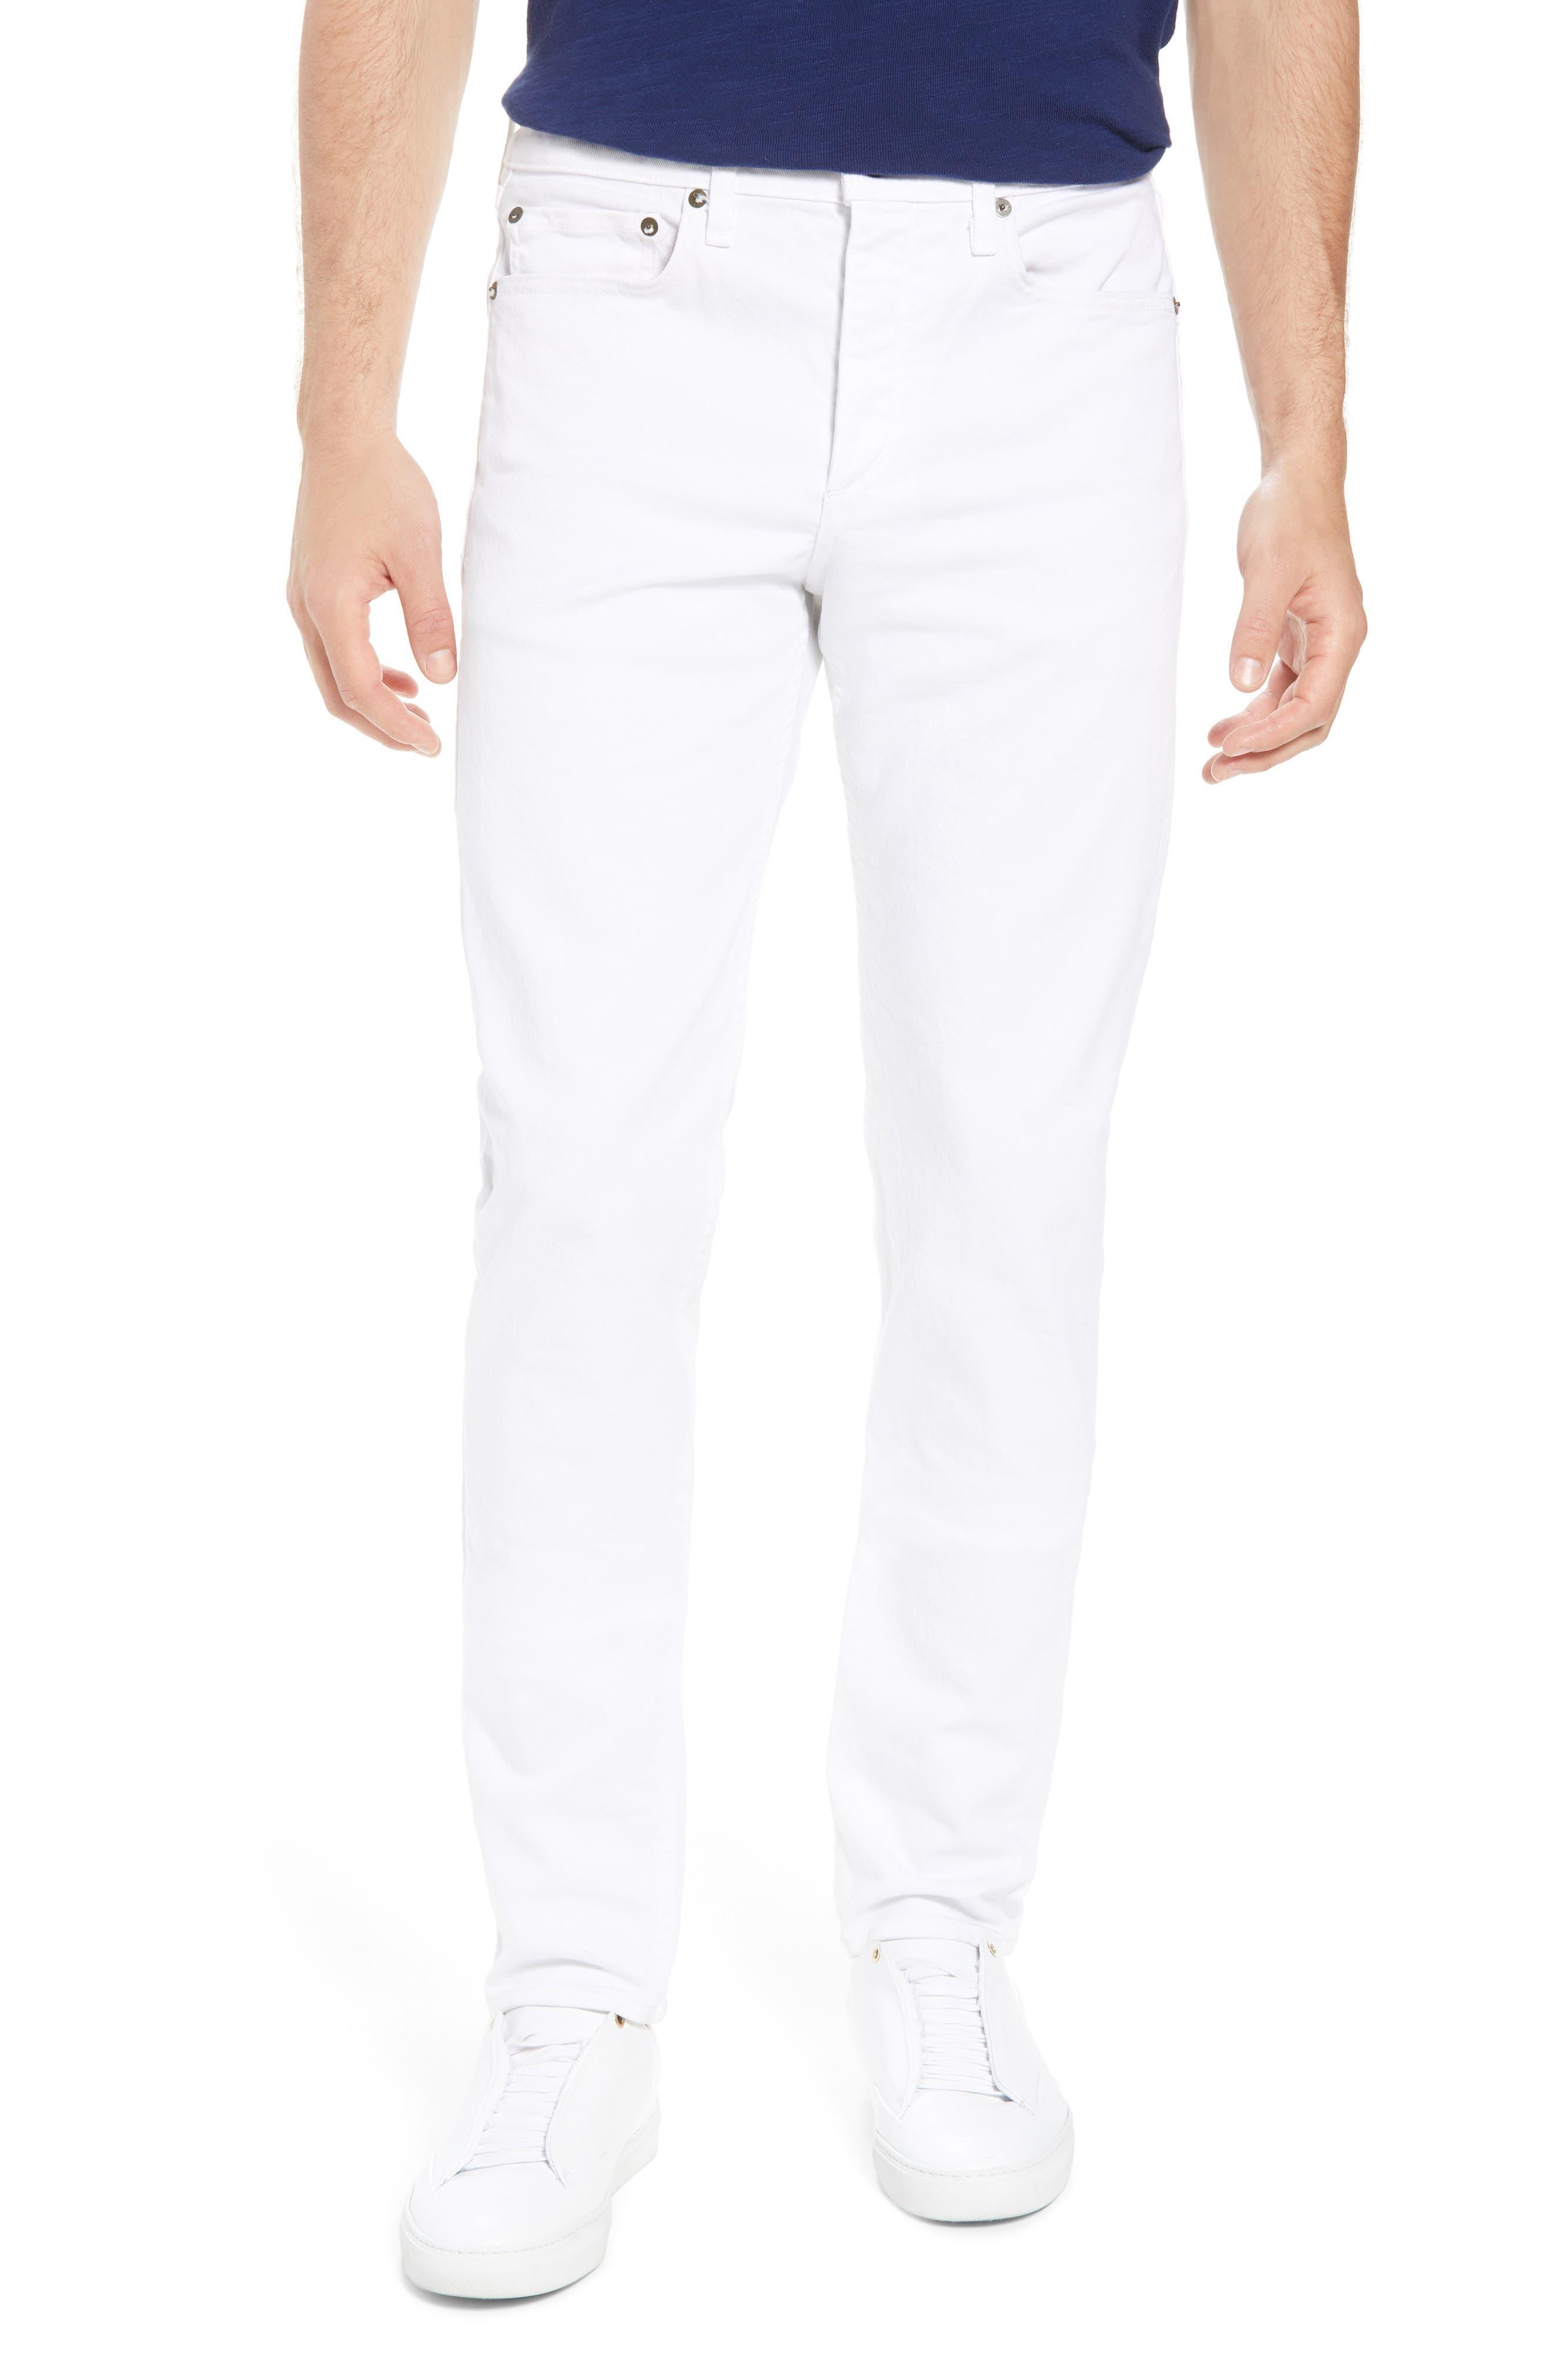 Fit 2 Slim Fit Jeans,                         Main,                         color, White